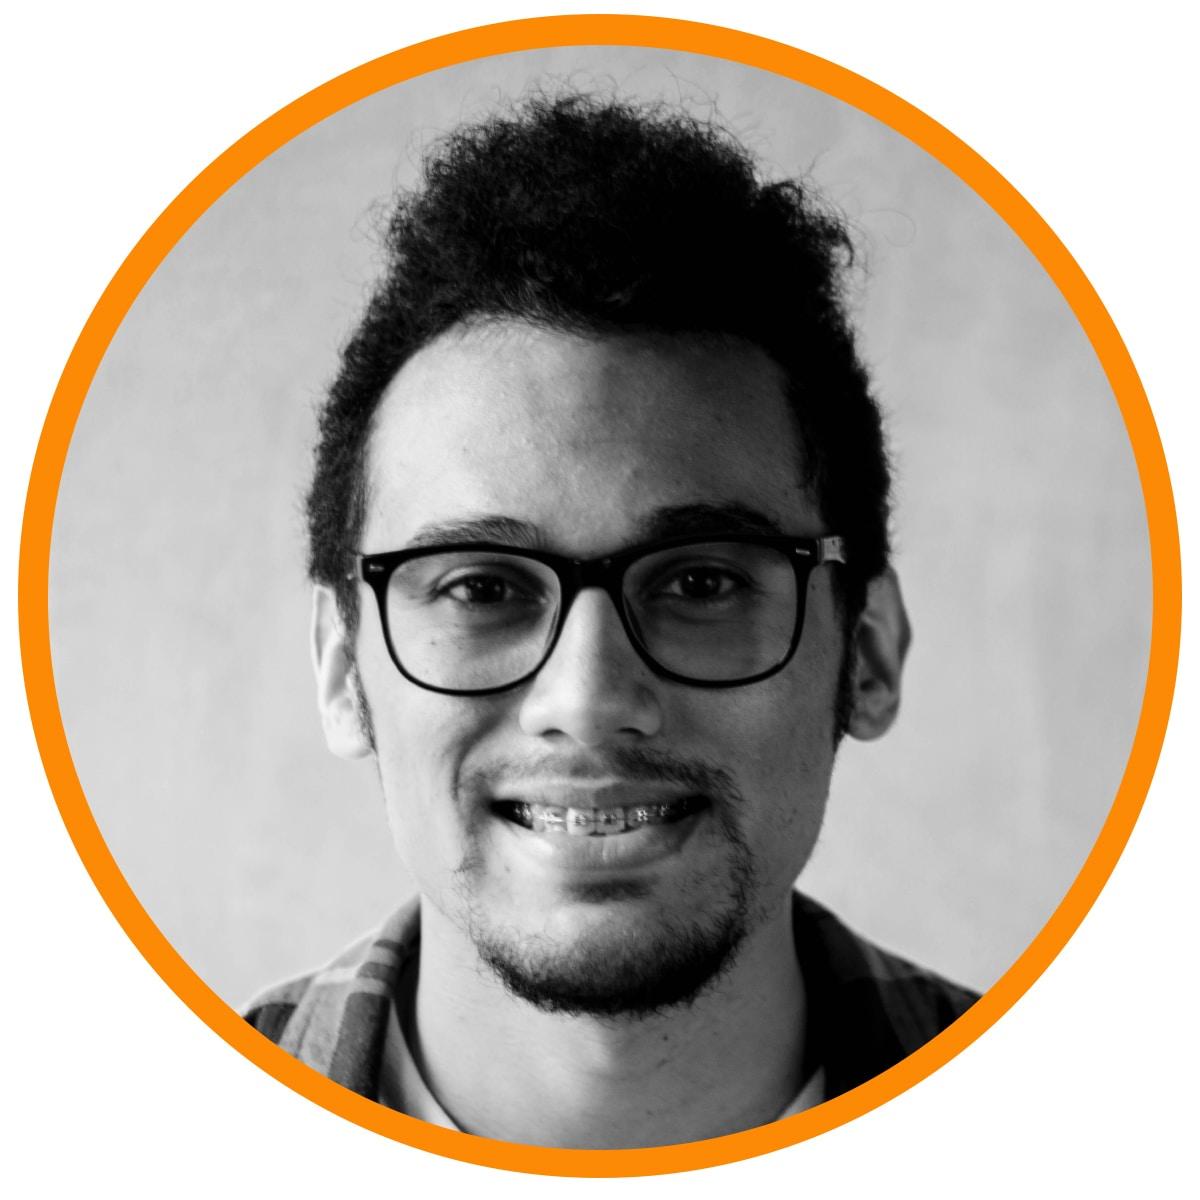 Go to Oscar Neira's profile